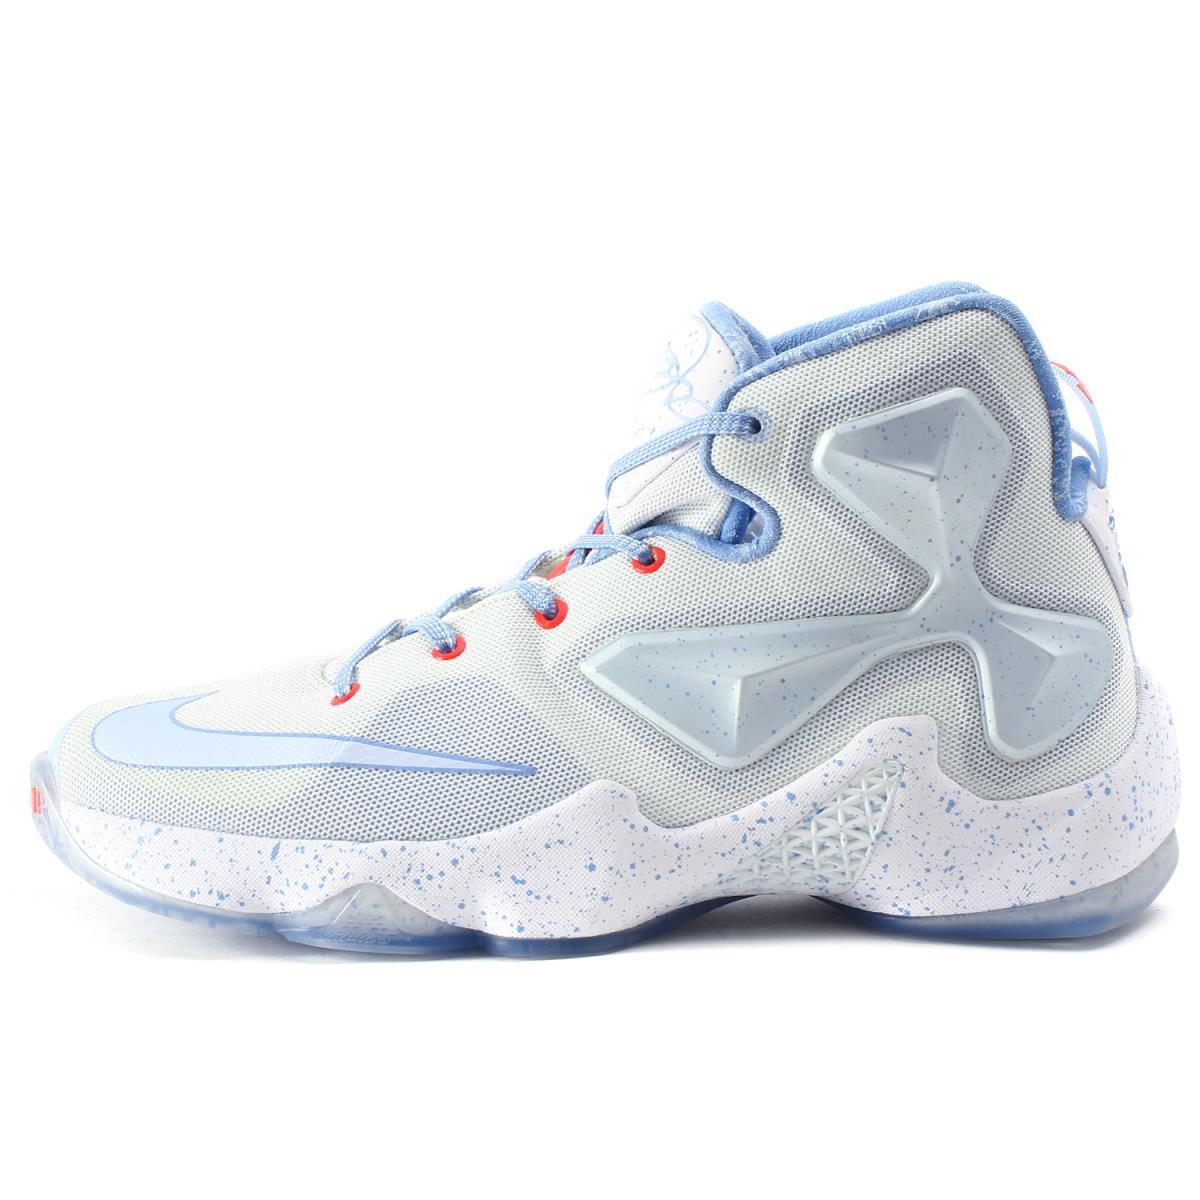 low priced 0acef 14820 NIKE (Nike) LEBRON 13 GS XMAS (824,502-144) summit white X ブルーティント  US7Y(25cm)